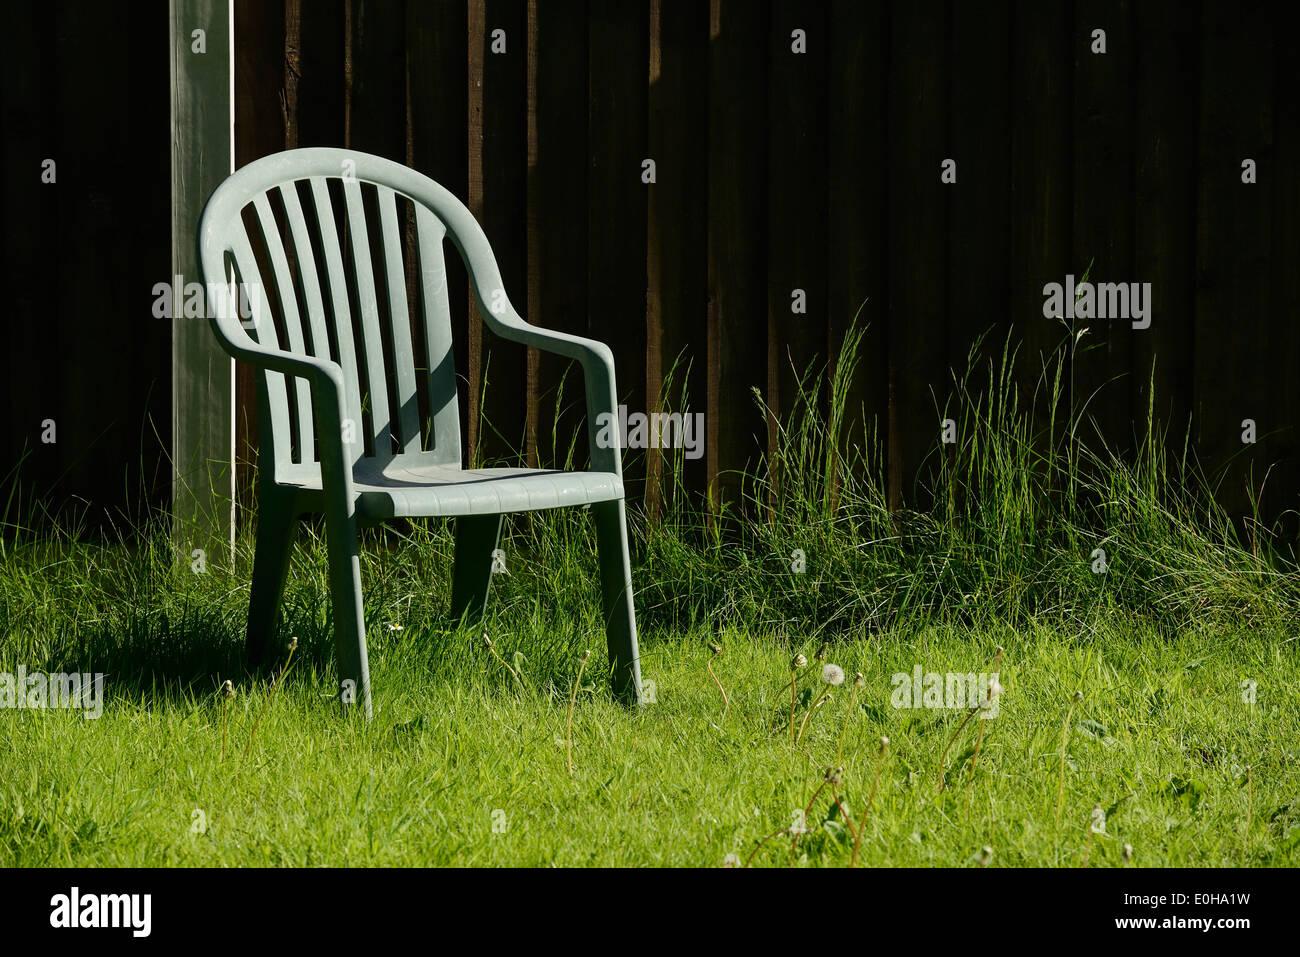 Solitary green plastic garden chair - Stock Image